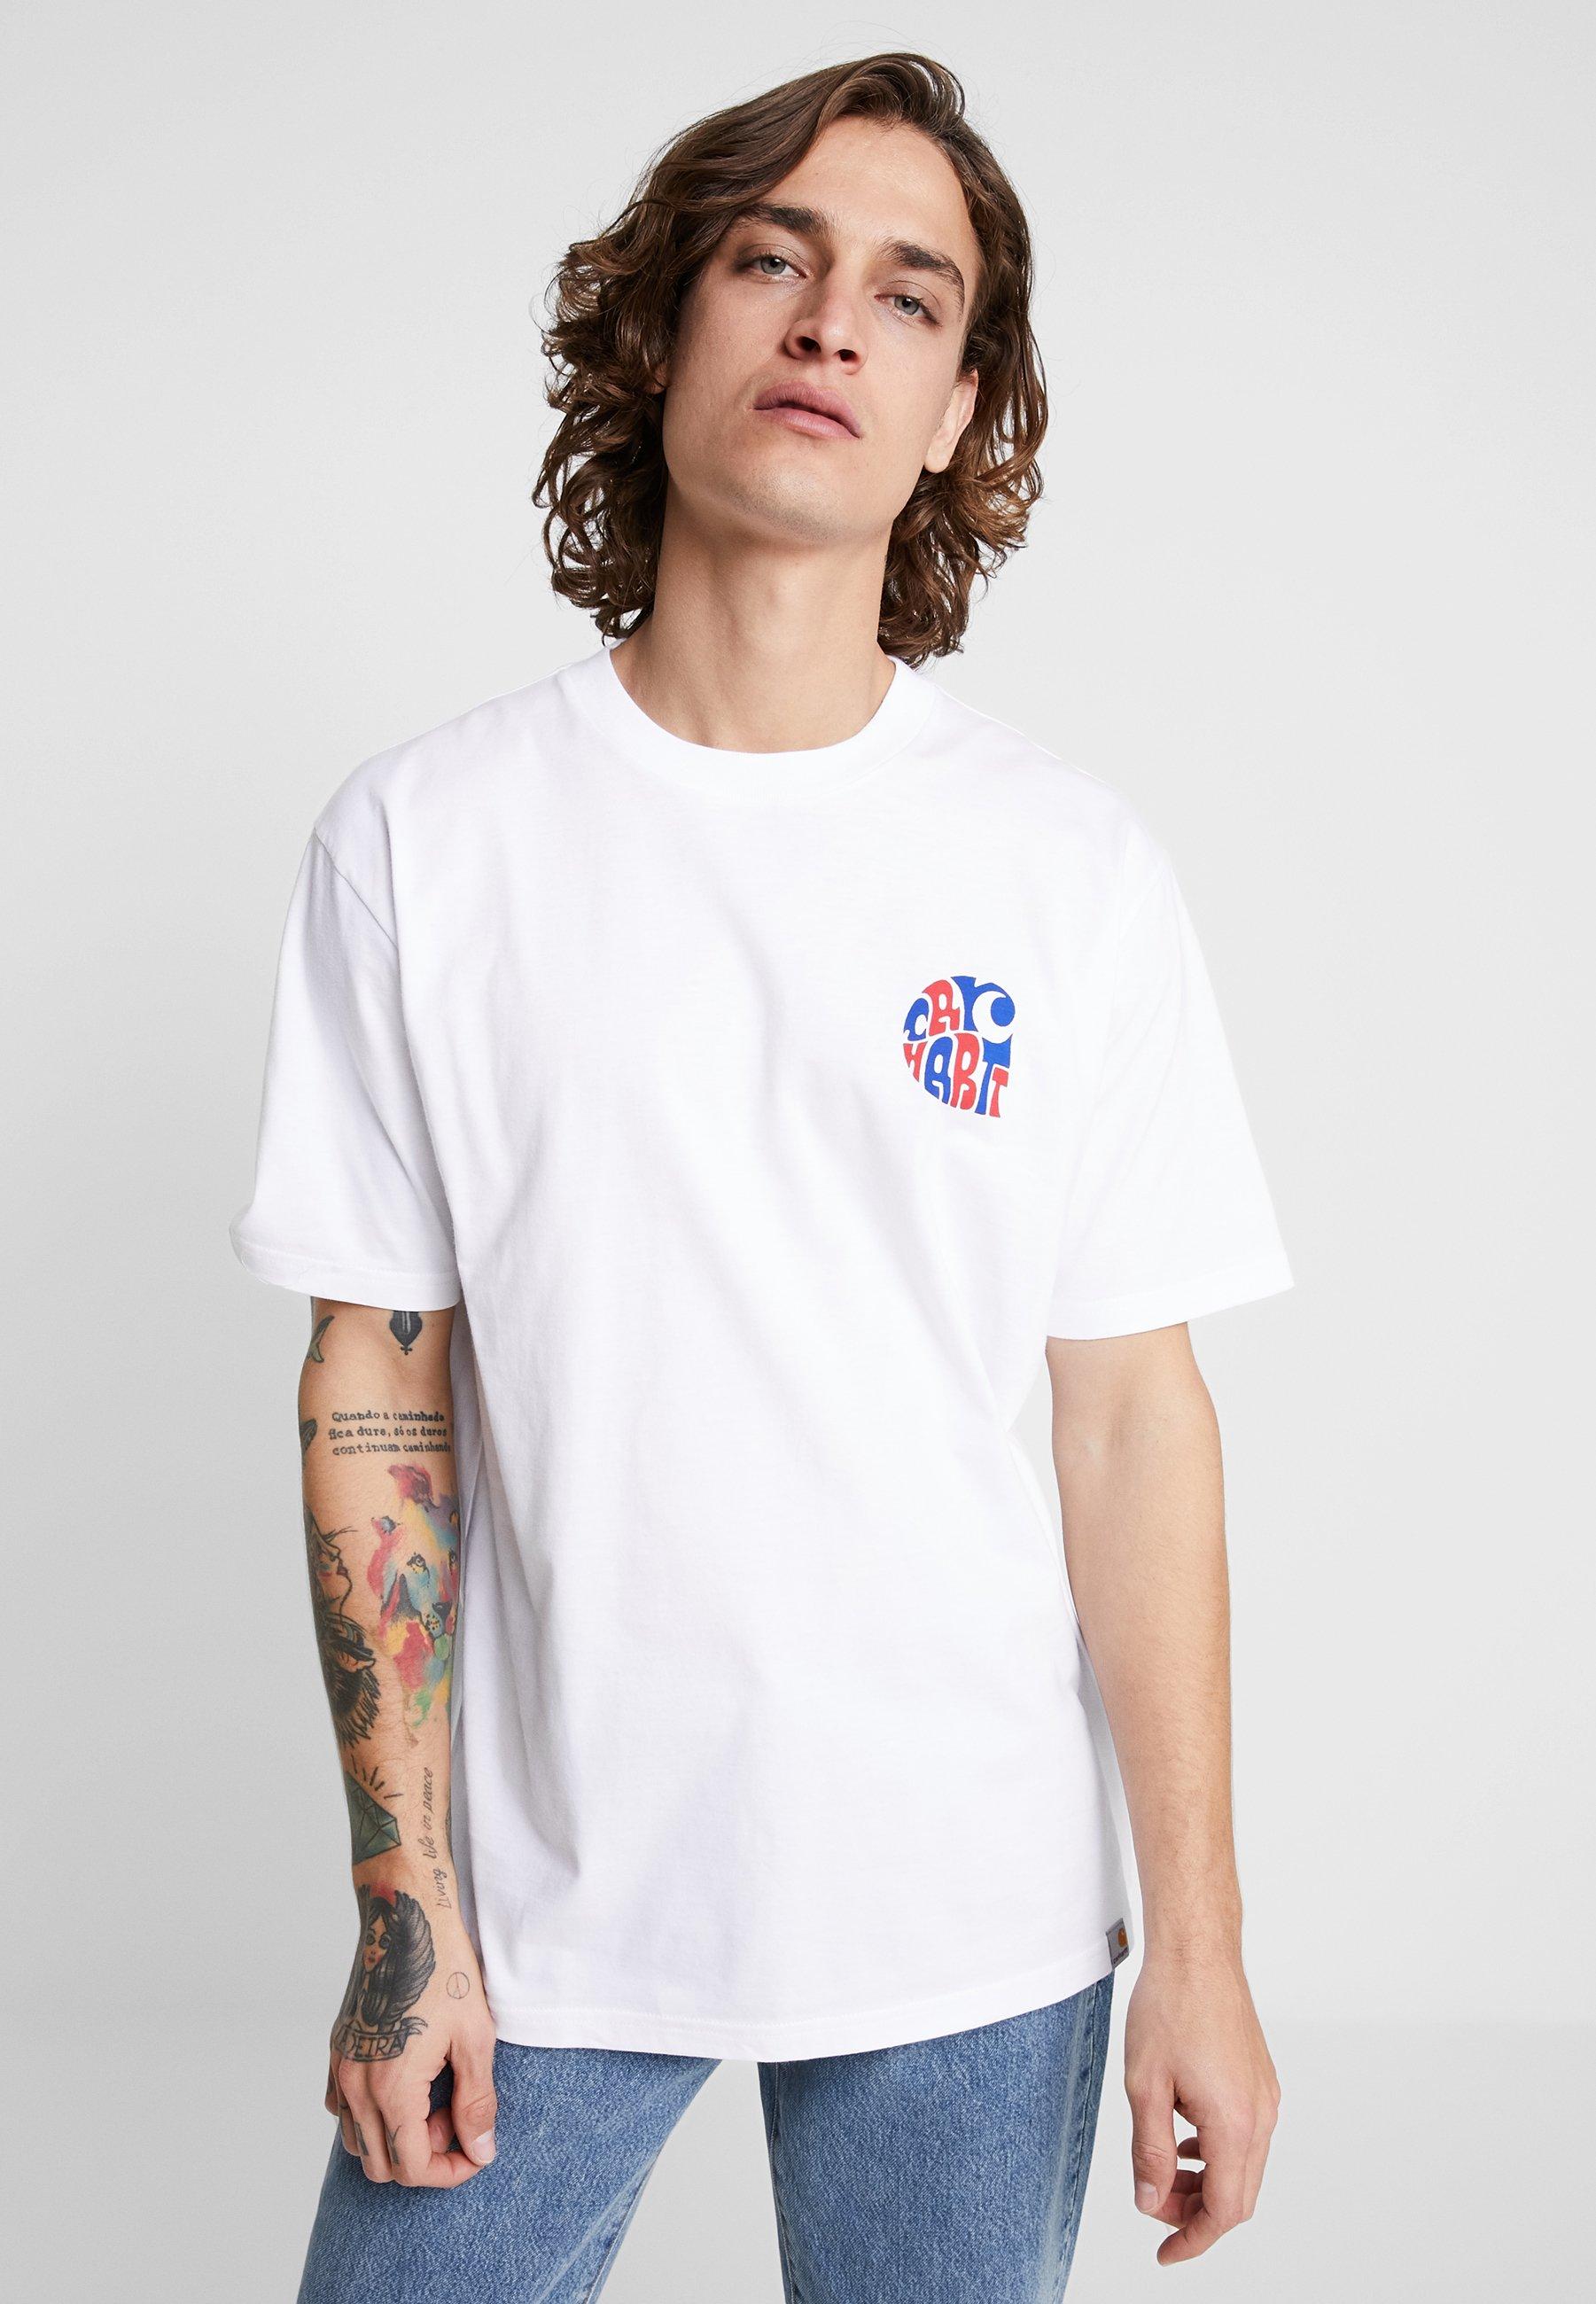 Wip shirt Carhartt Imprimé White ClearwaterT n8wPN0ZOkX